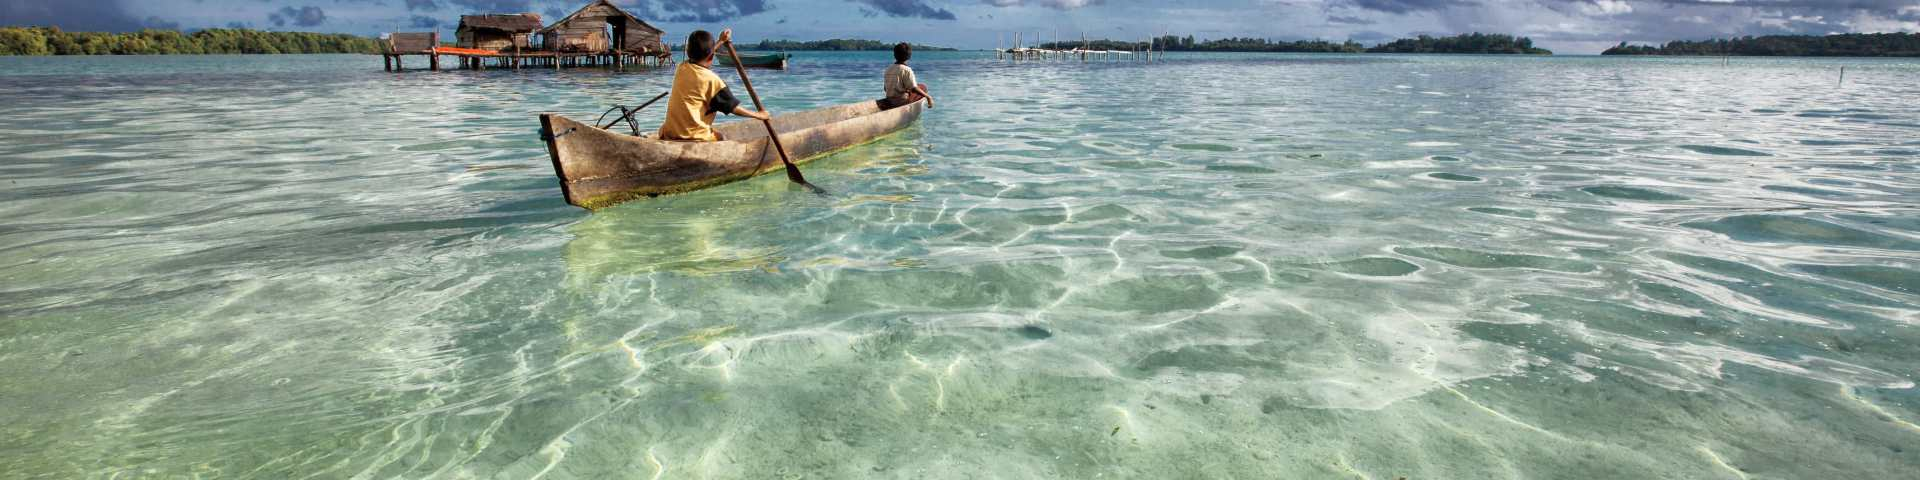 Indonesia offbeat destinations